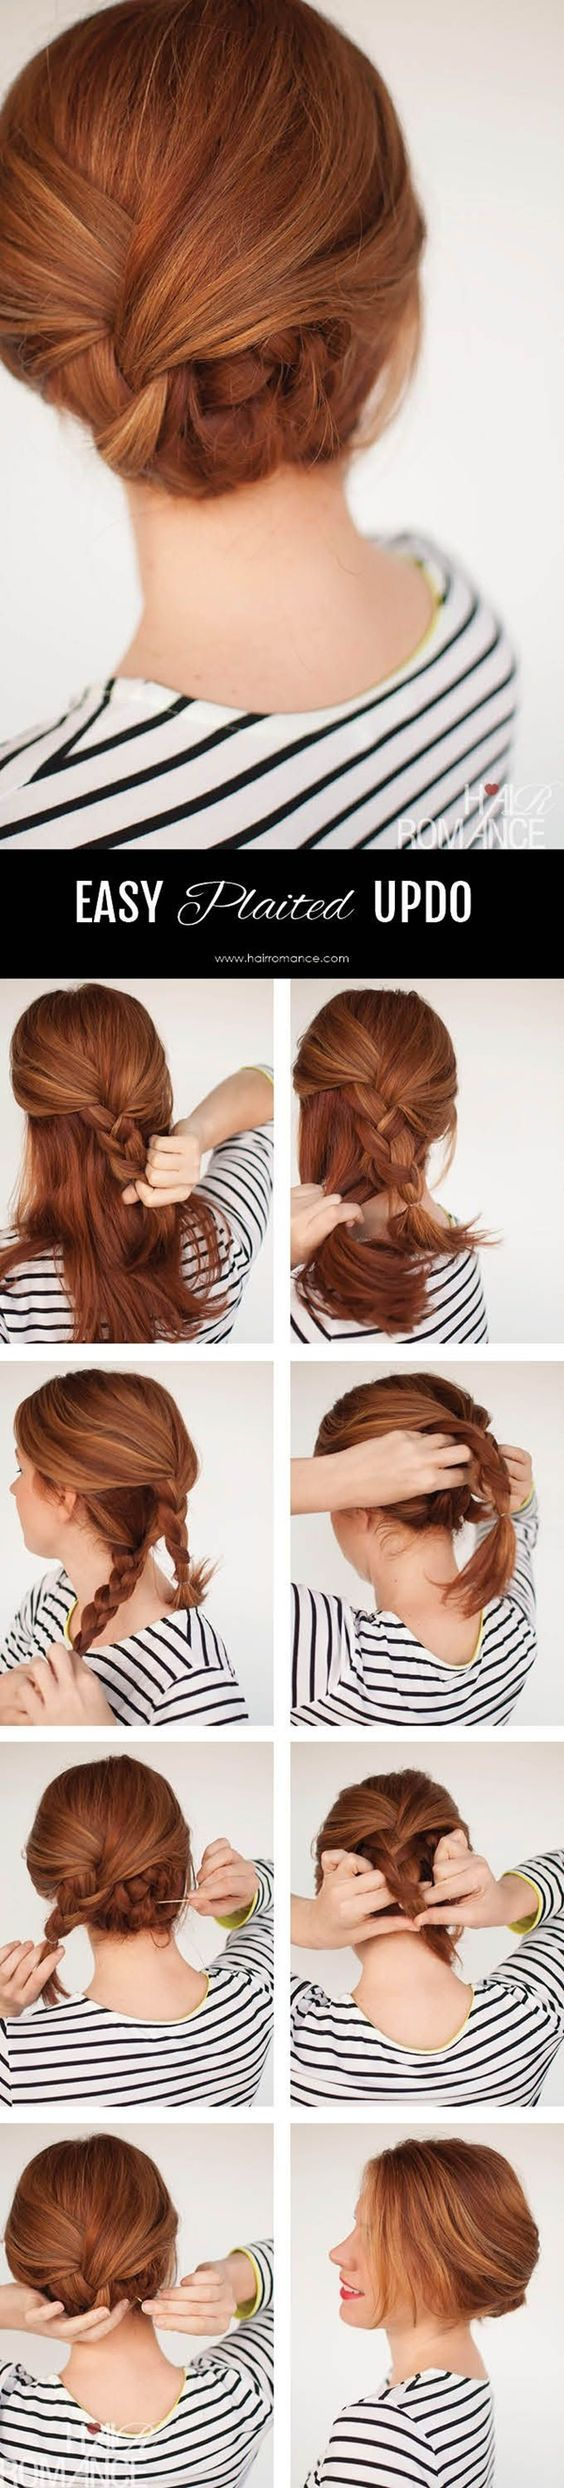 Peinado recogido cabello mediano